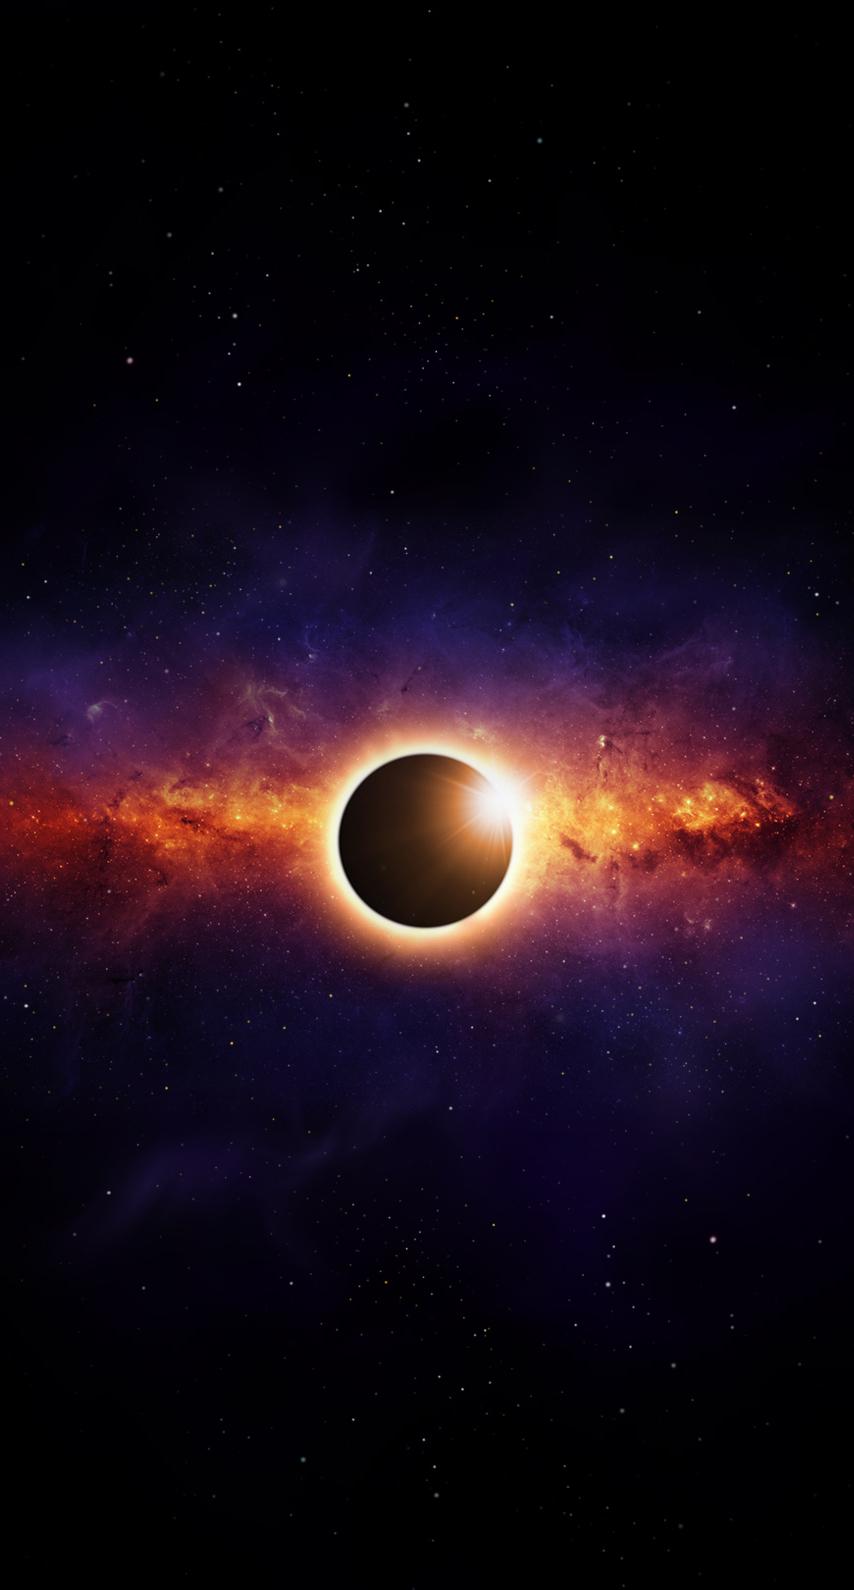 telescope, eclipse, solar system